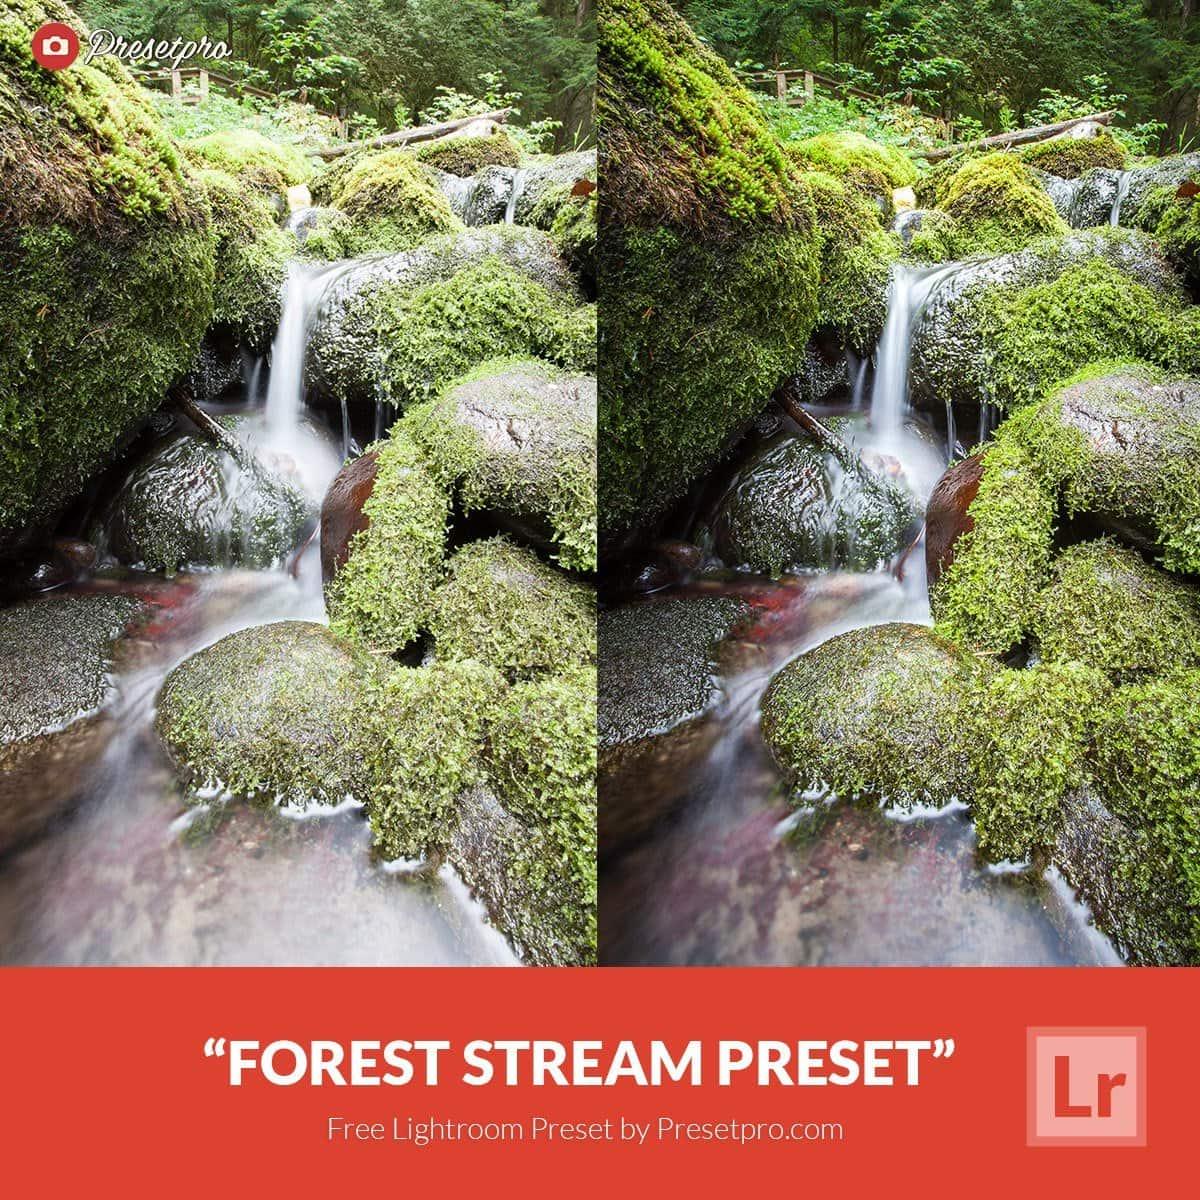 Free-Lightroom-Preset-Forest-Stream